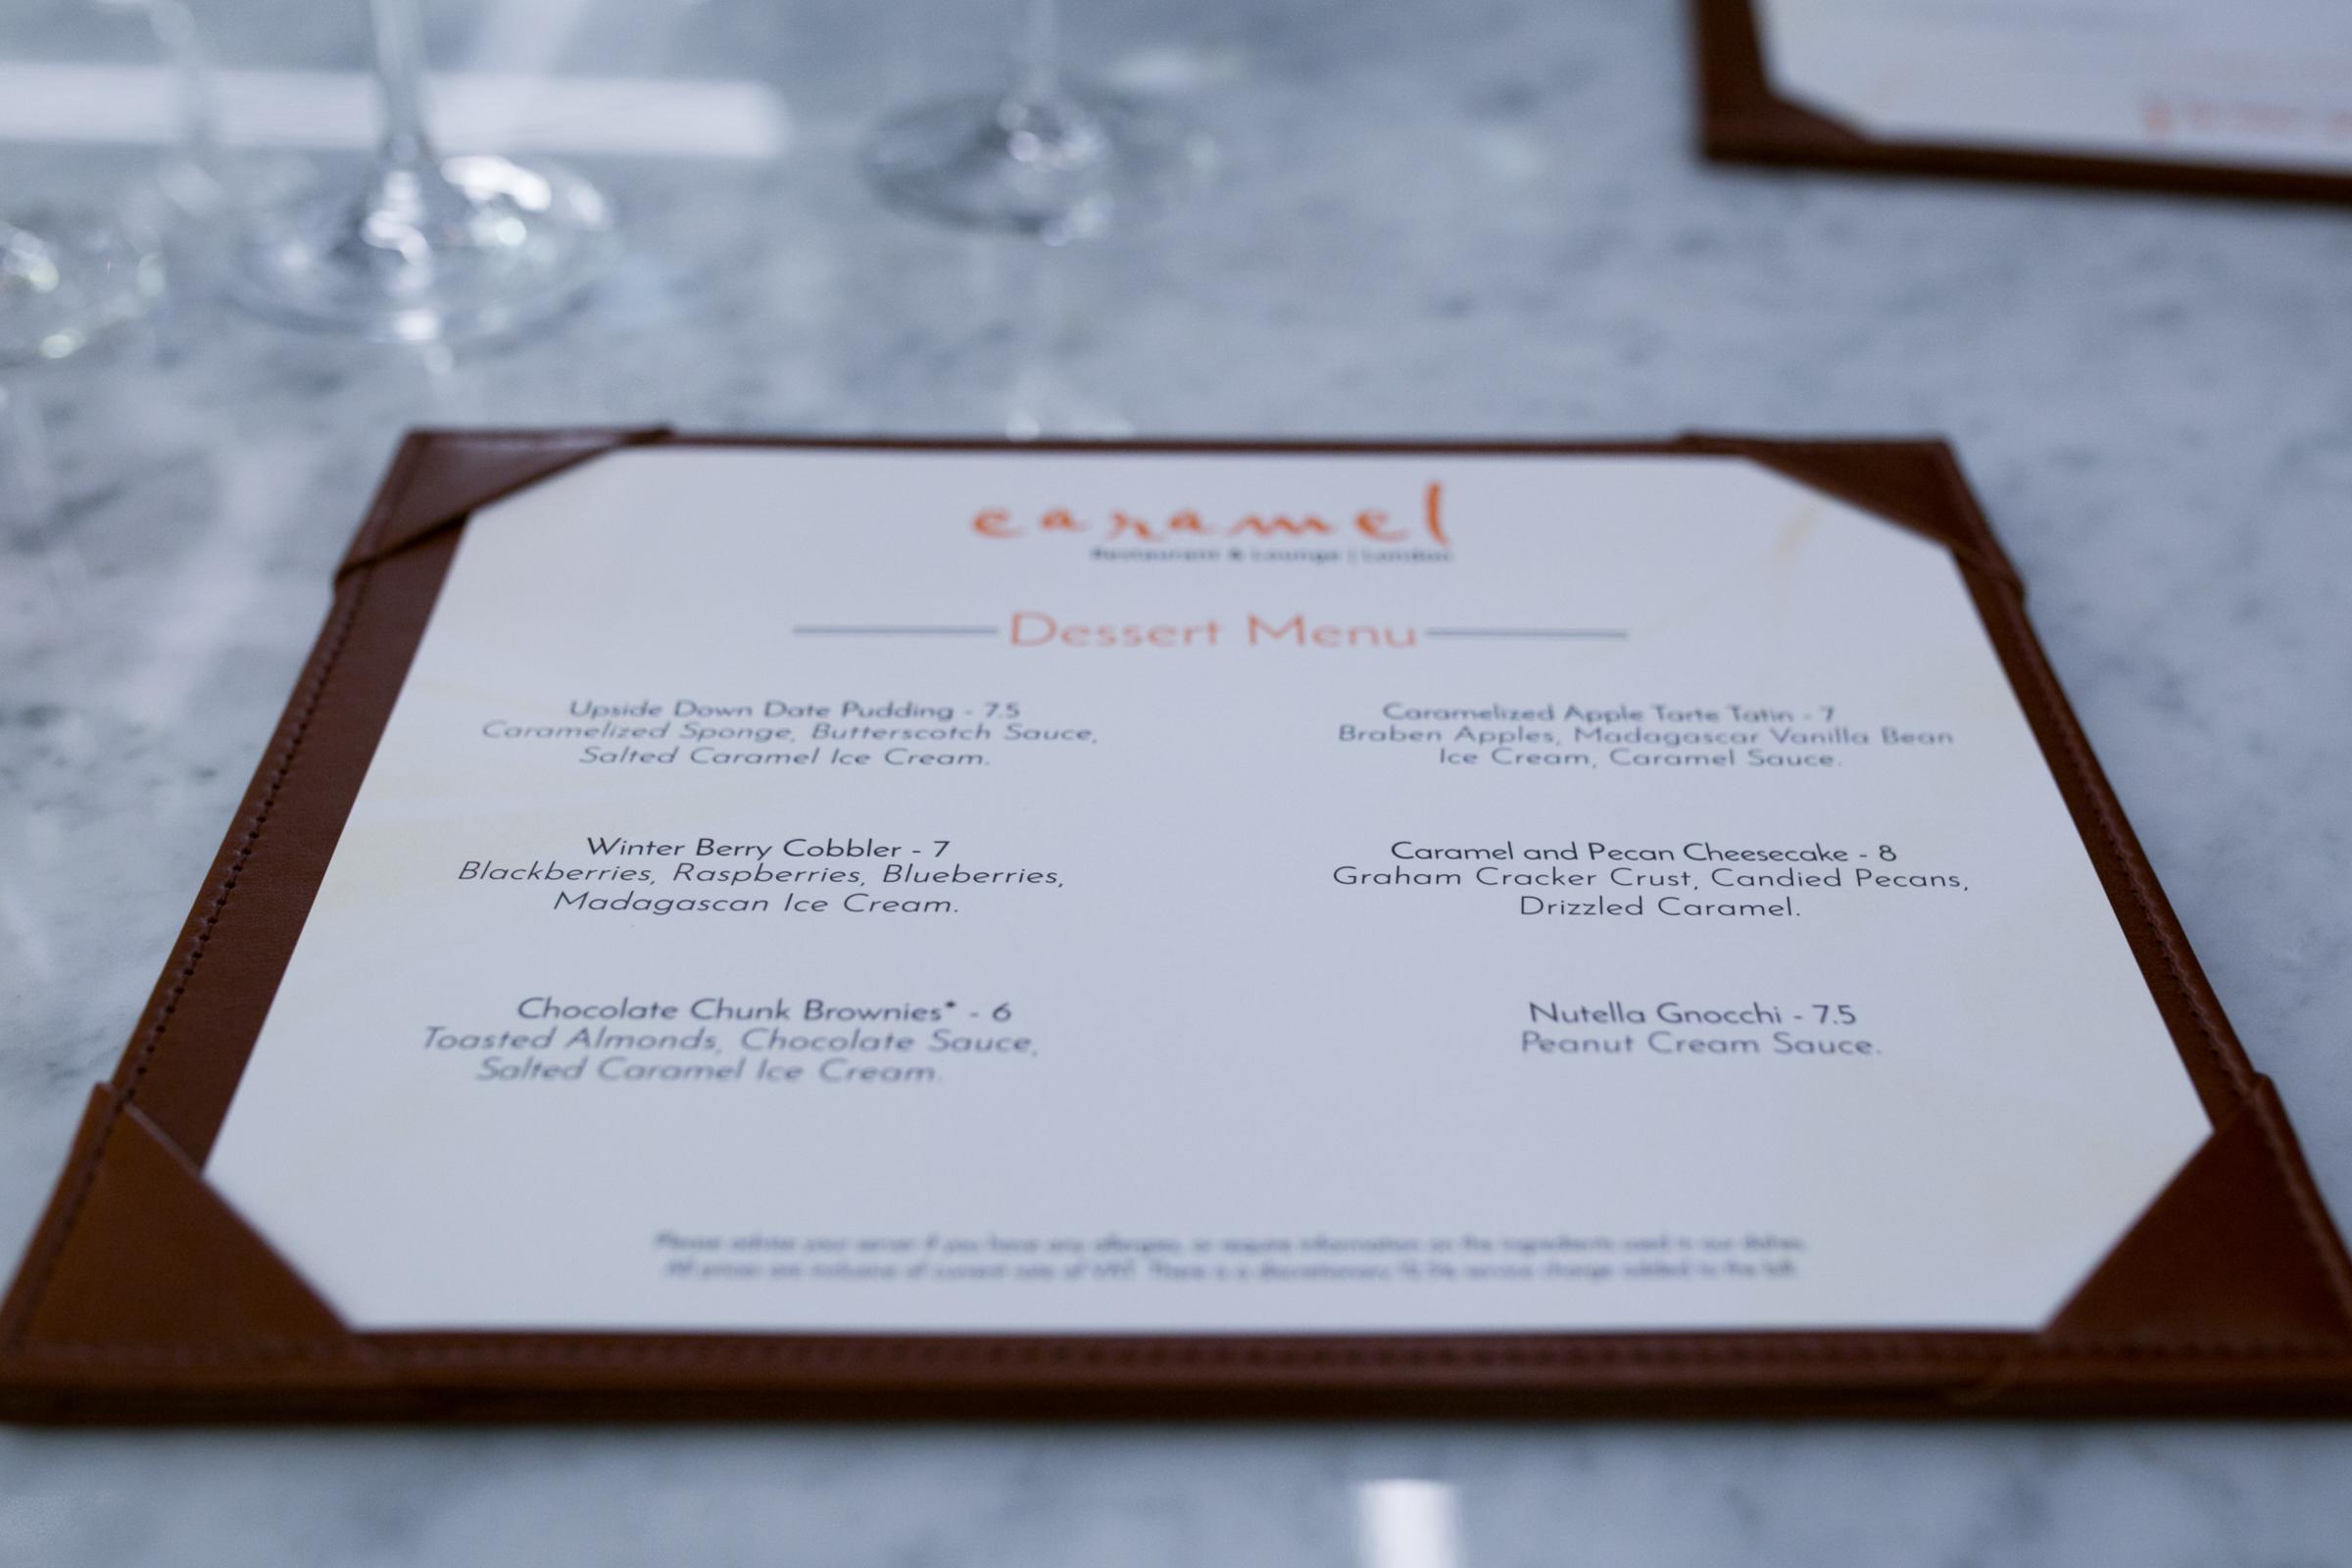 Caramel-restaurant-and-lounge-london-abu-dabi-dubai-oman-new-restaurant-in-london-minas-planet-review-jasmina-haskovic19.jpg